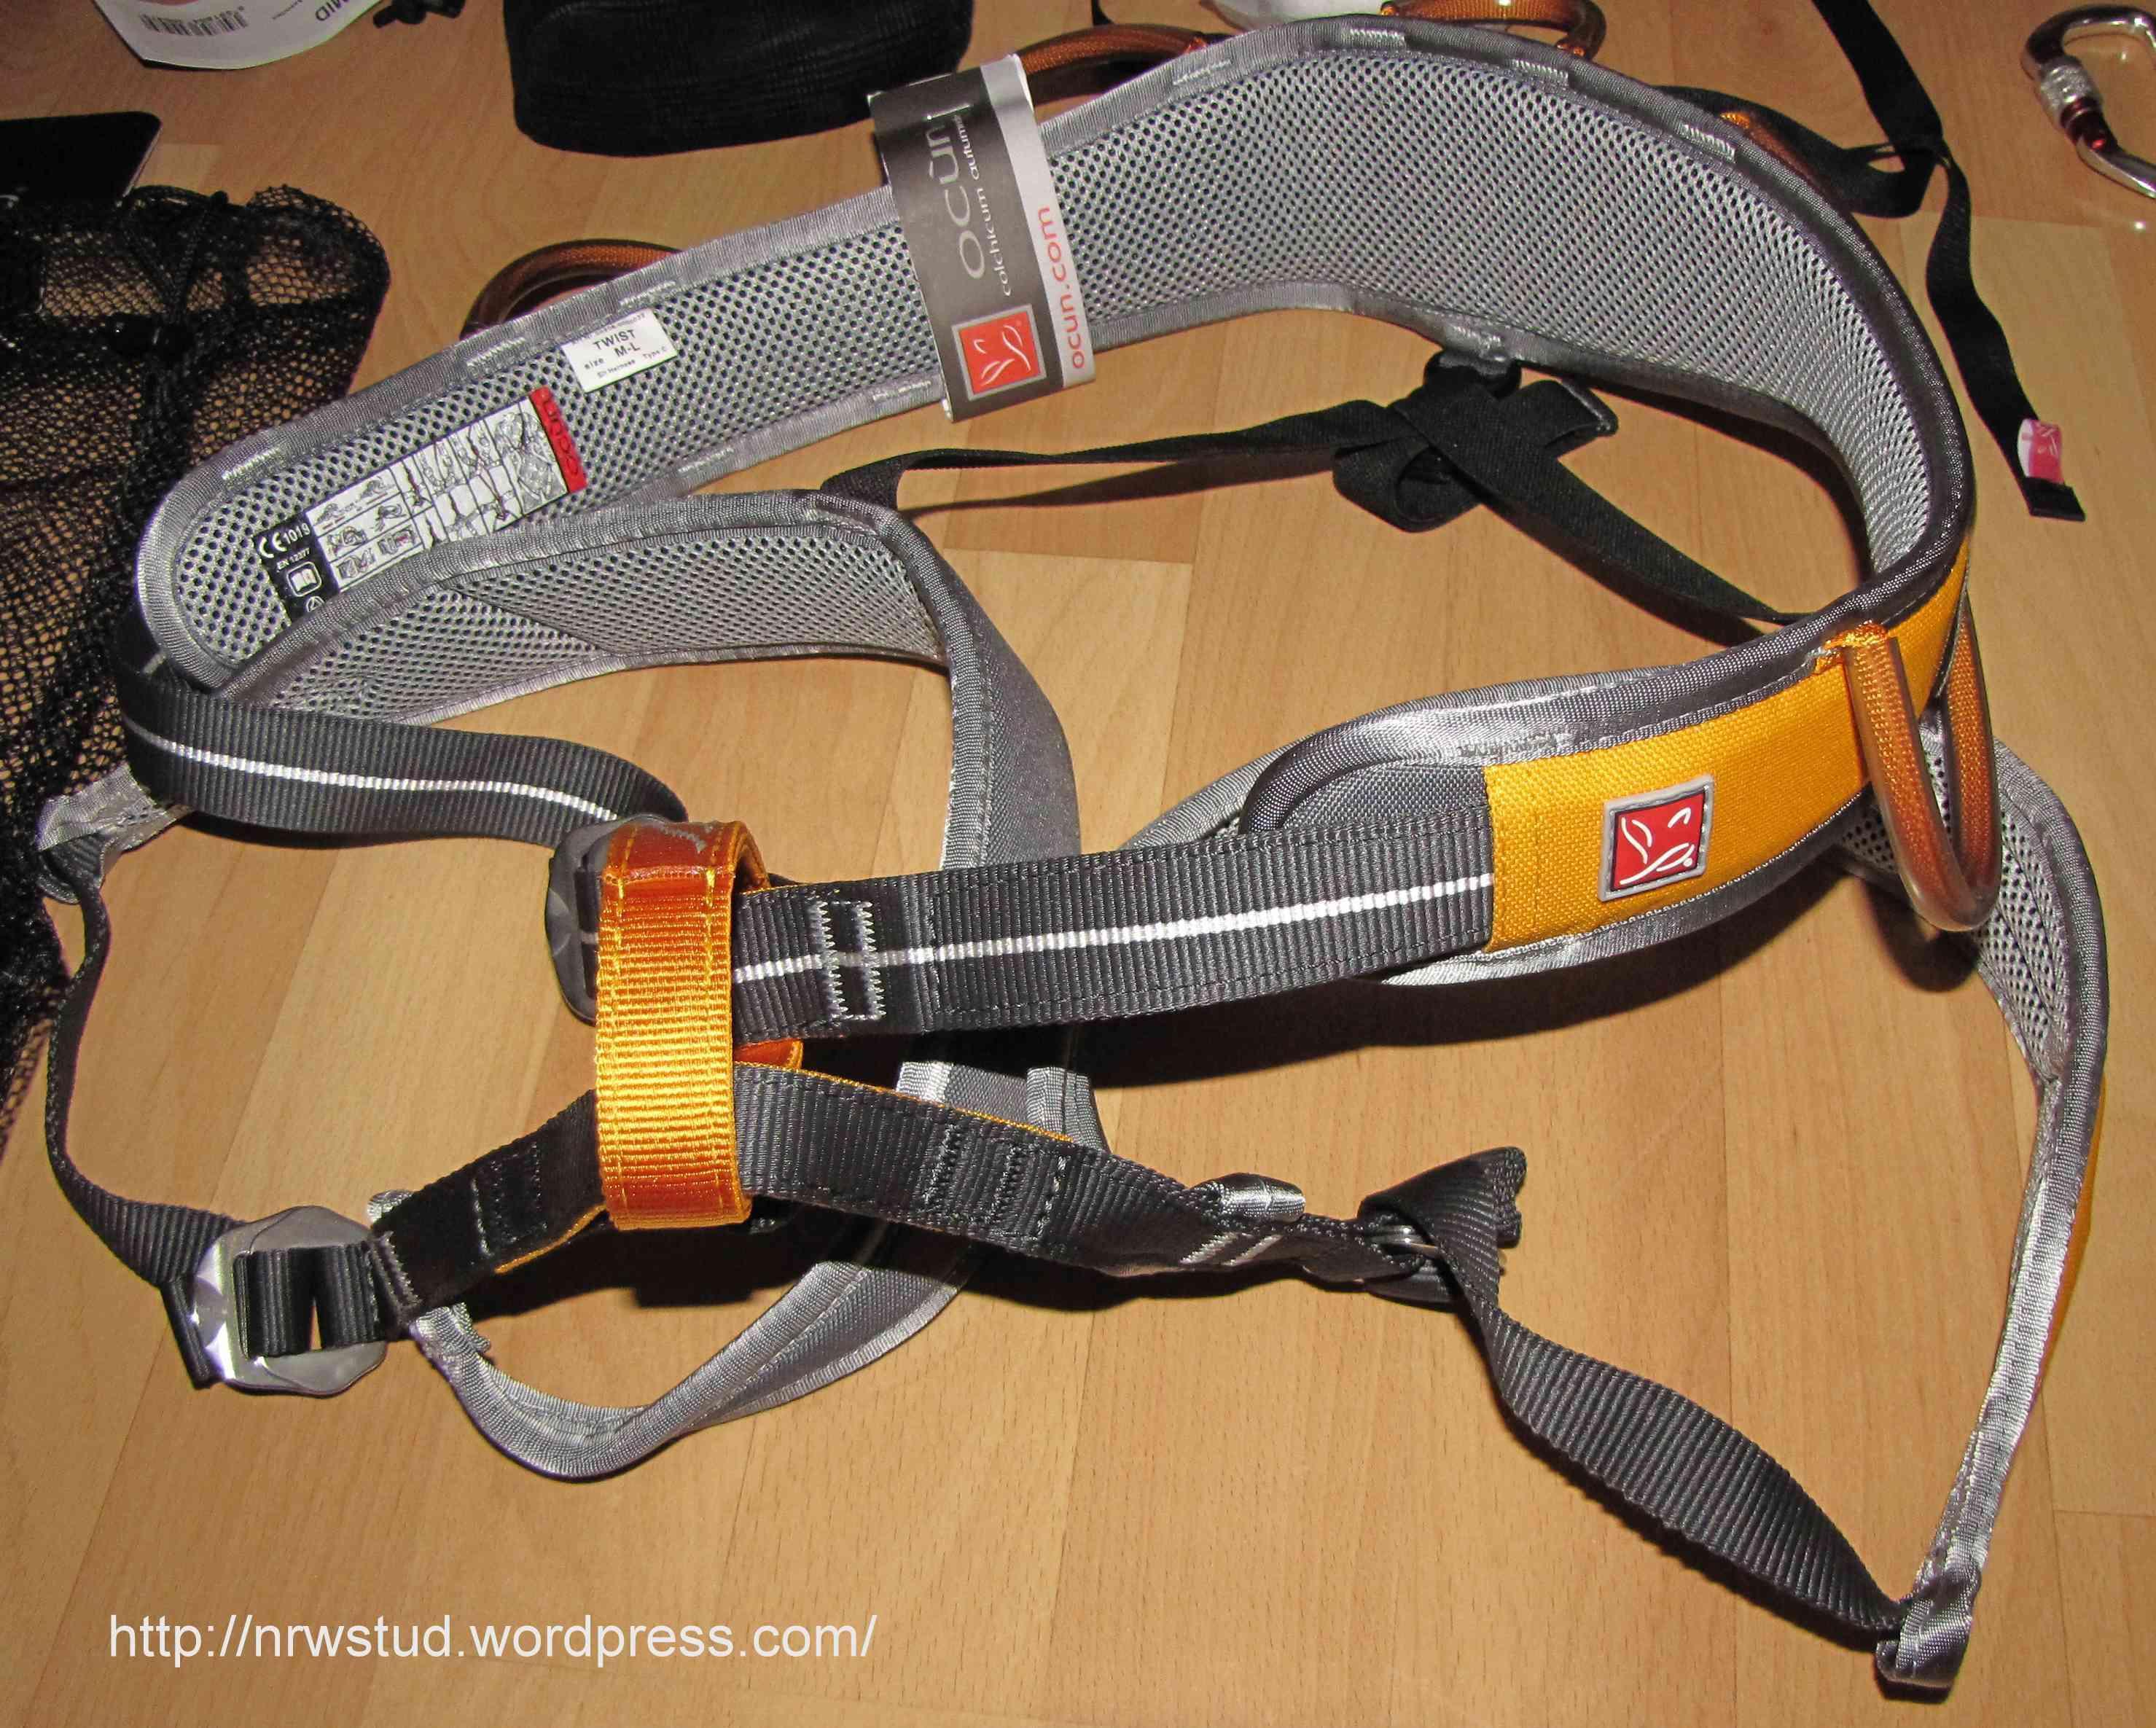 Petzl Klettergurt Corax Test : Ocùn u2013 twist klettergurt nrwstuds outdoorblog trekkinggear.de